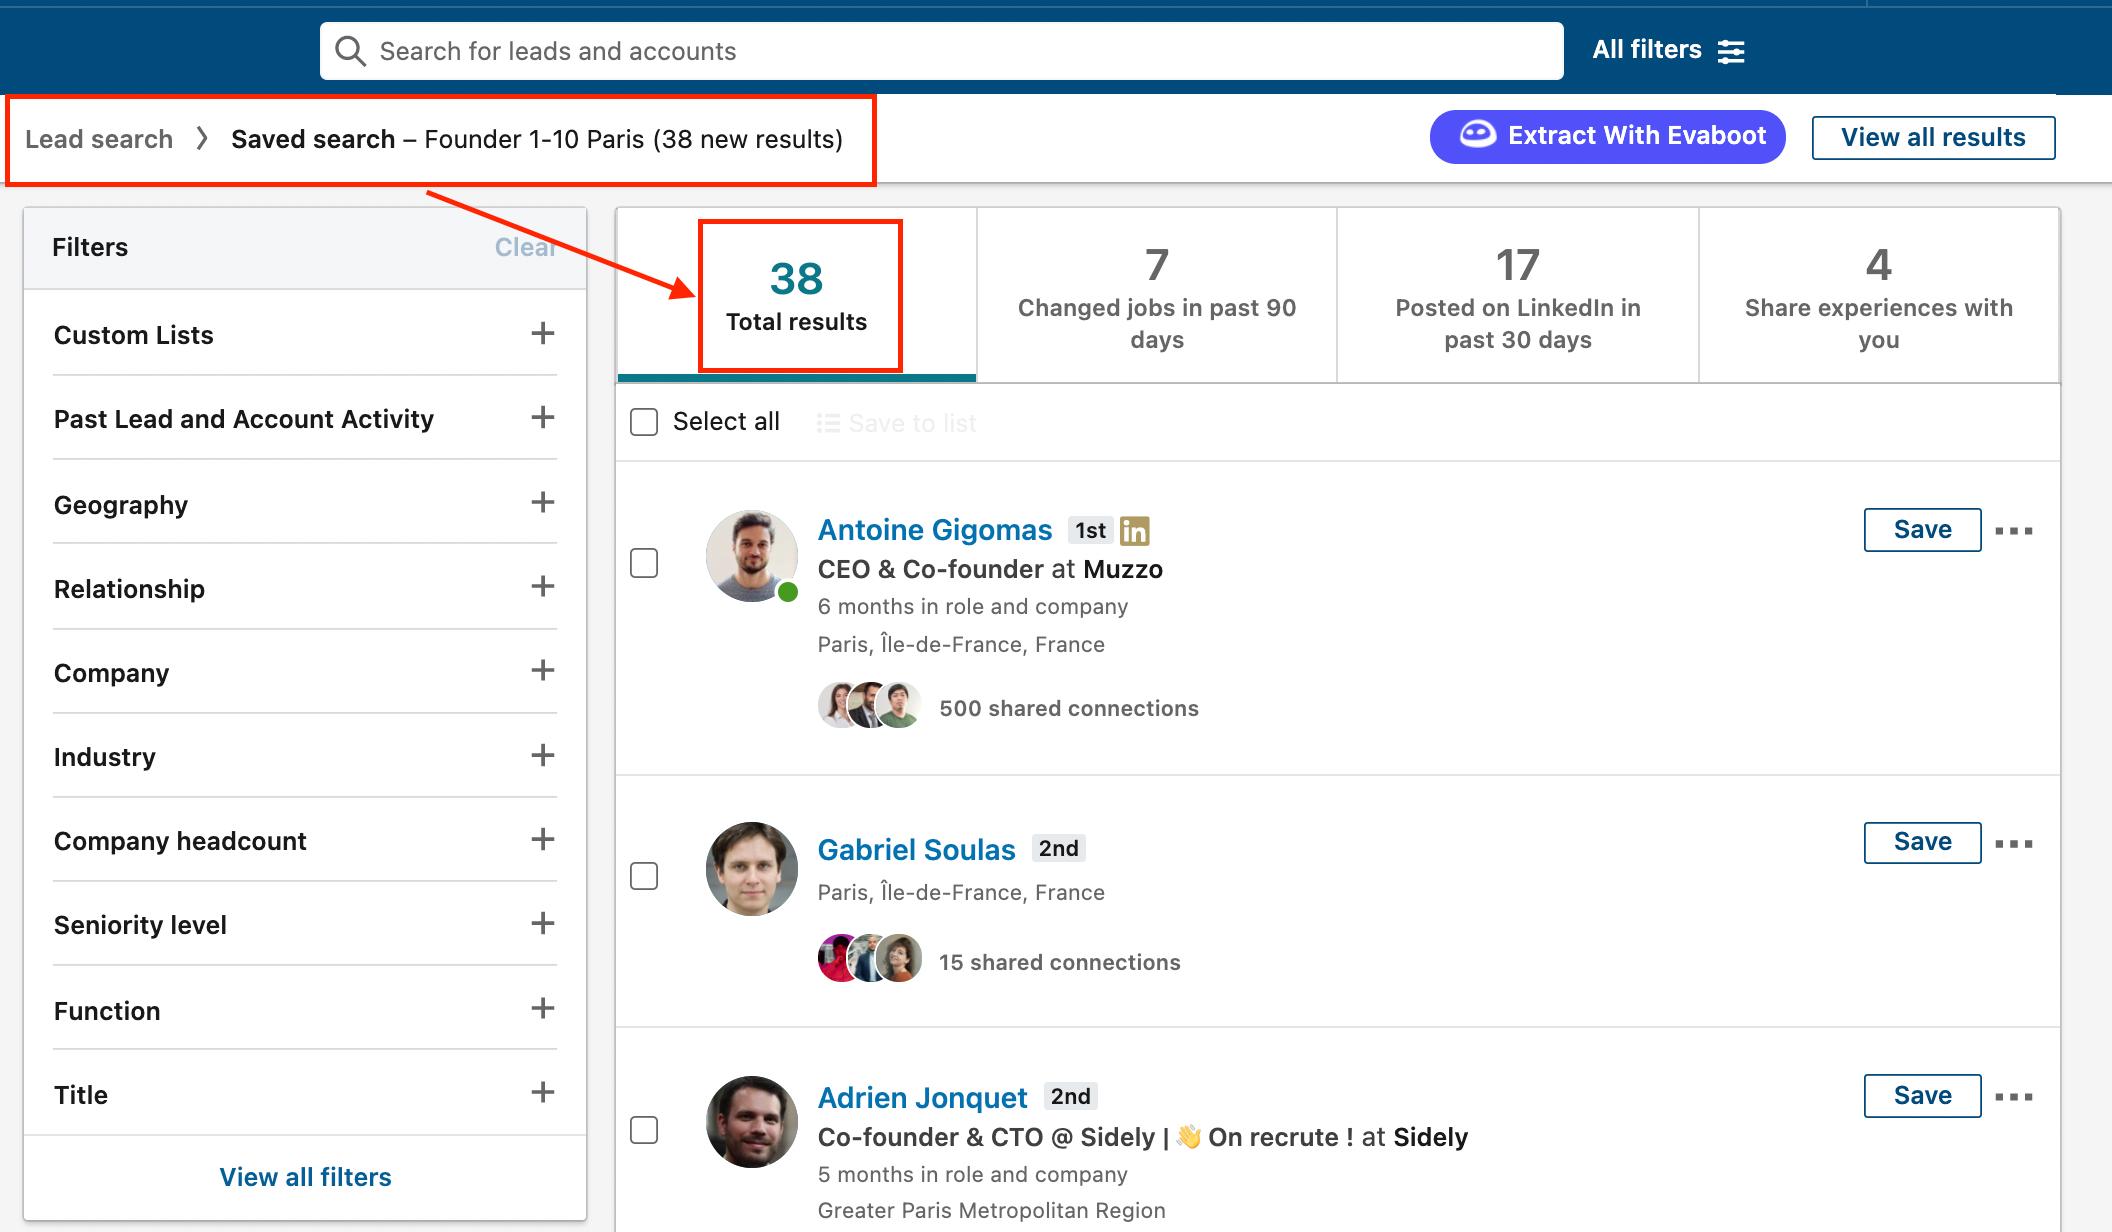 linkedin-sales-navigator-saved-search-results.png